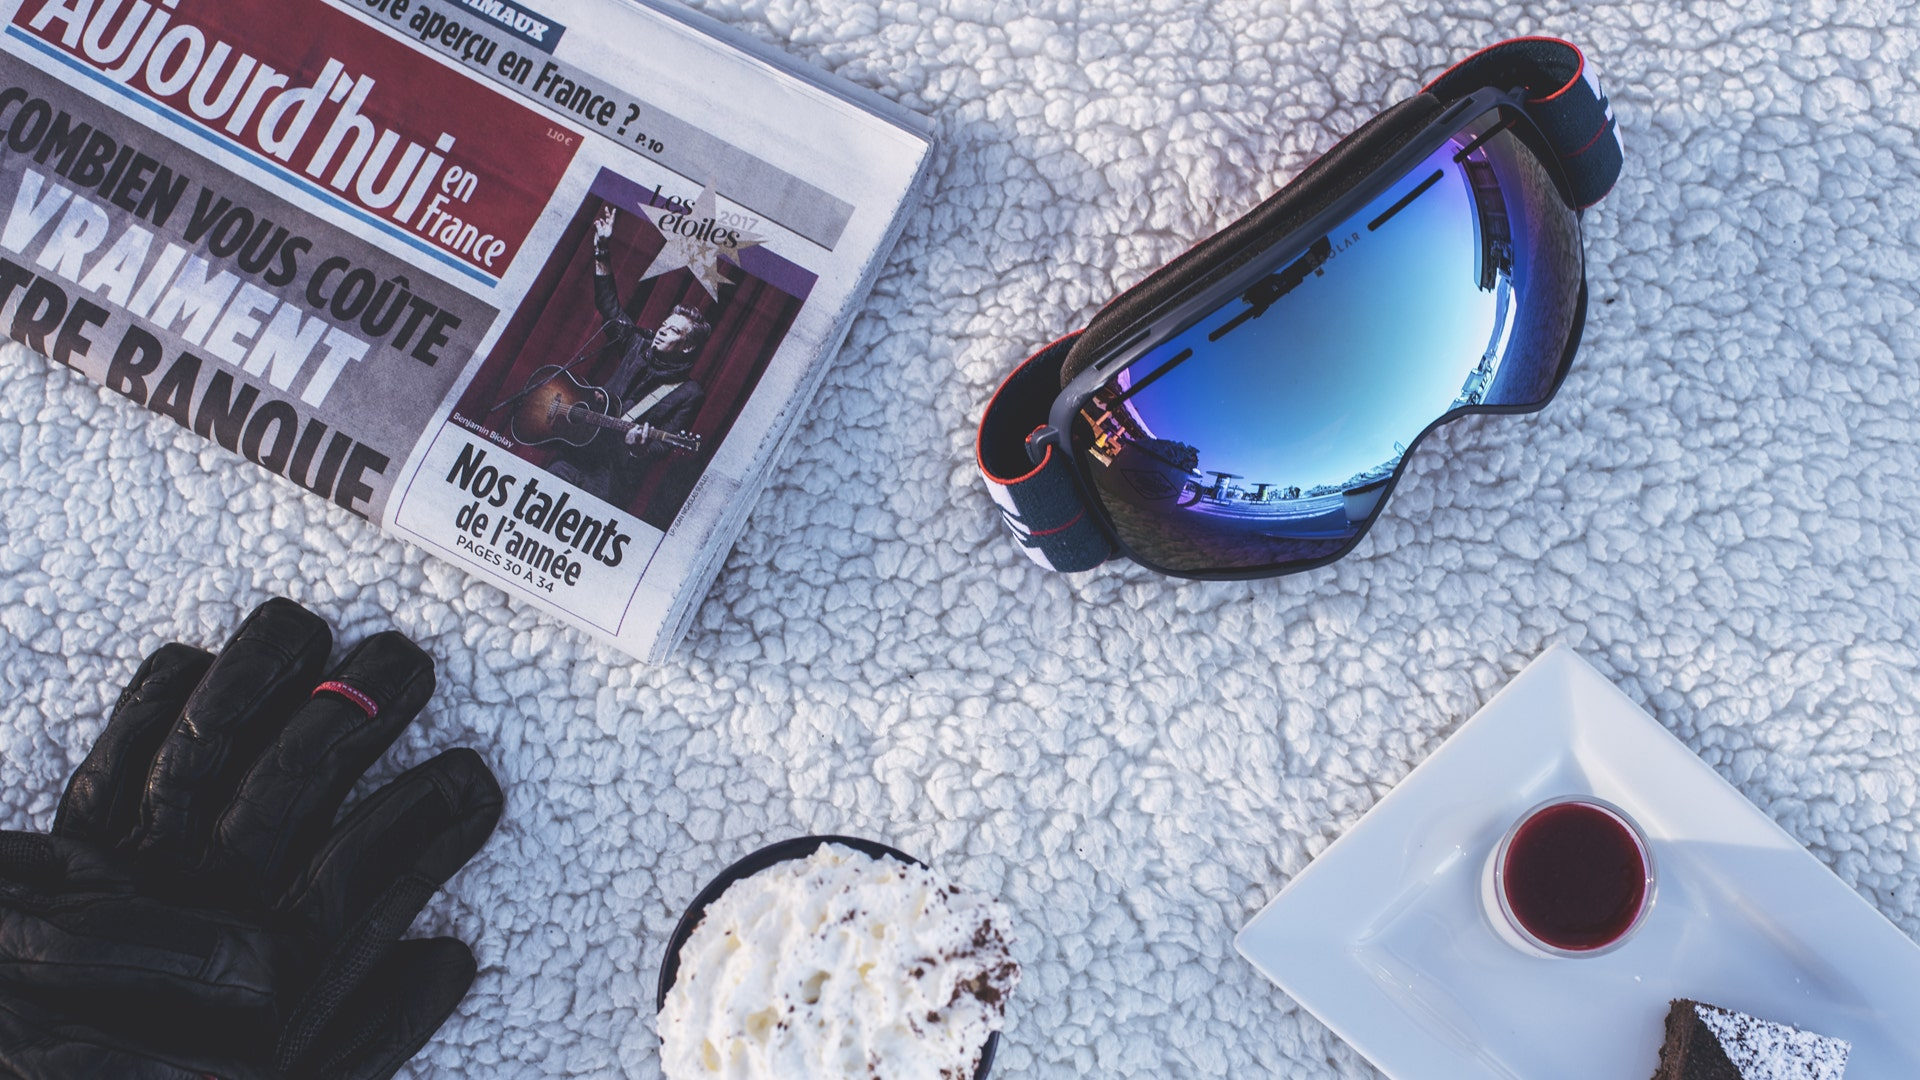 goggles, snowboard, ski, winter, men, women